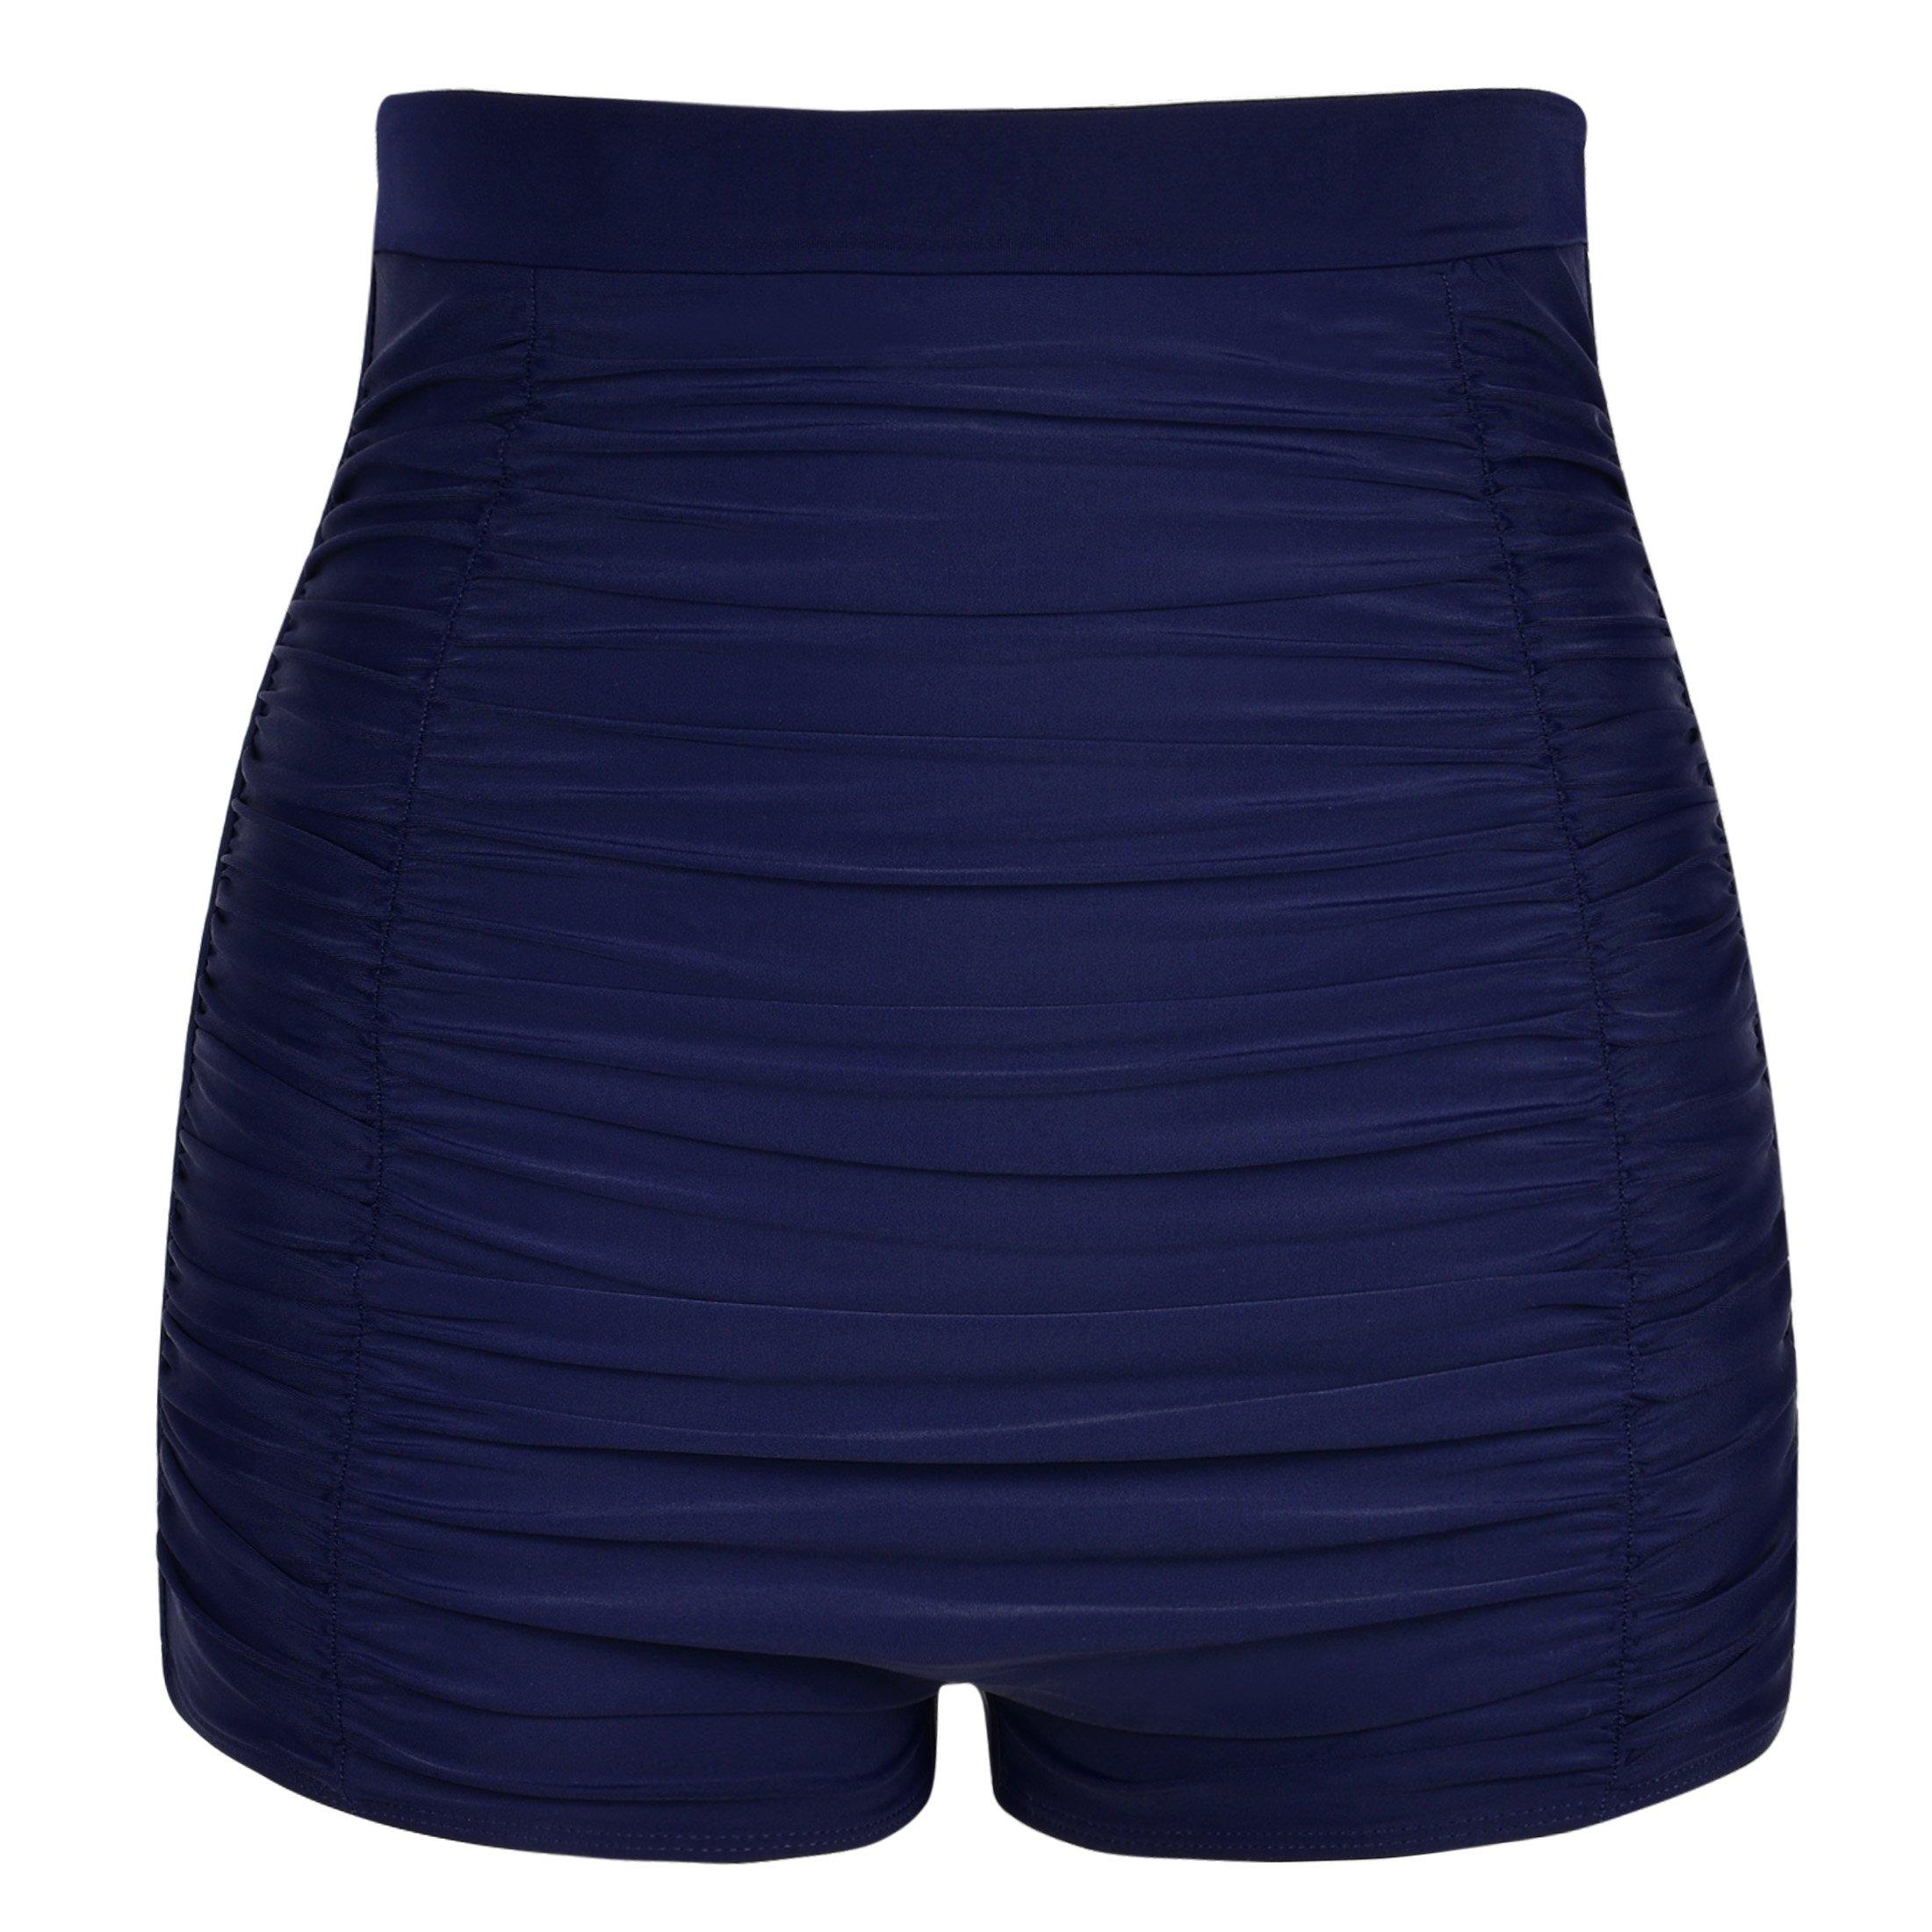 f69da9fb01995 Get Quotations · Hilor Women's Retro Ultra High Waisted Swim Bottom Boy Leg  Tankini Shorts Ruched Swimwear Briefs